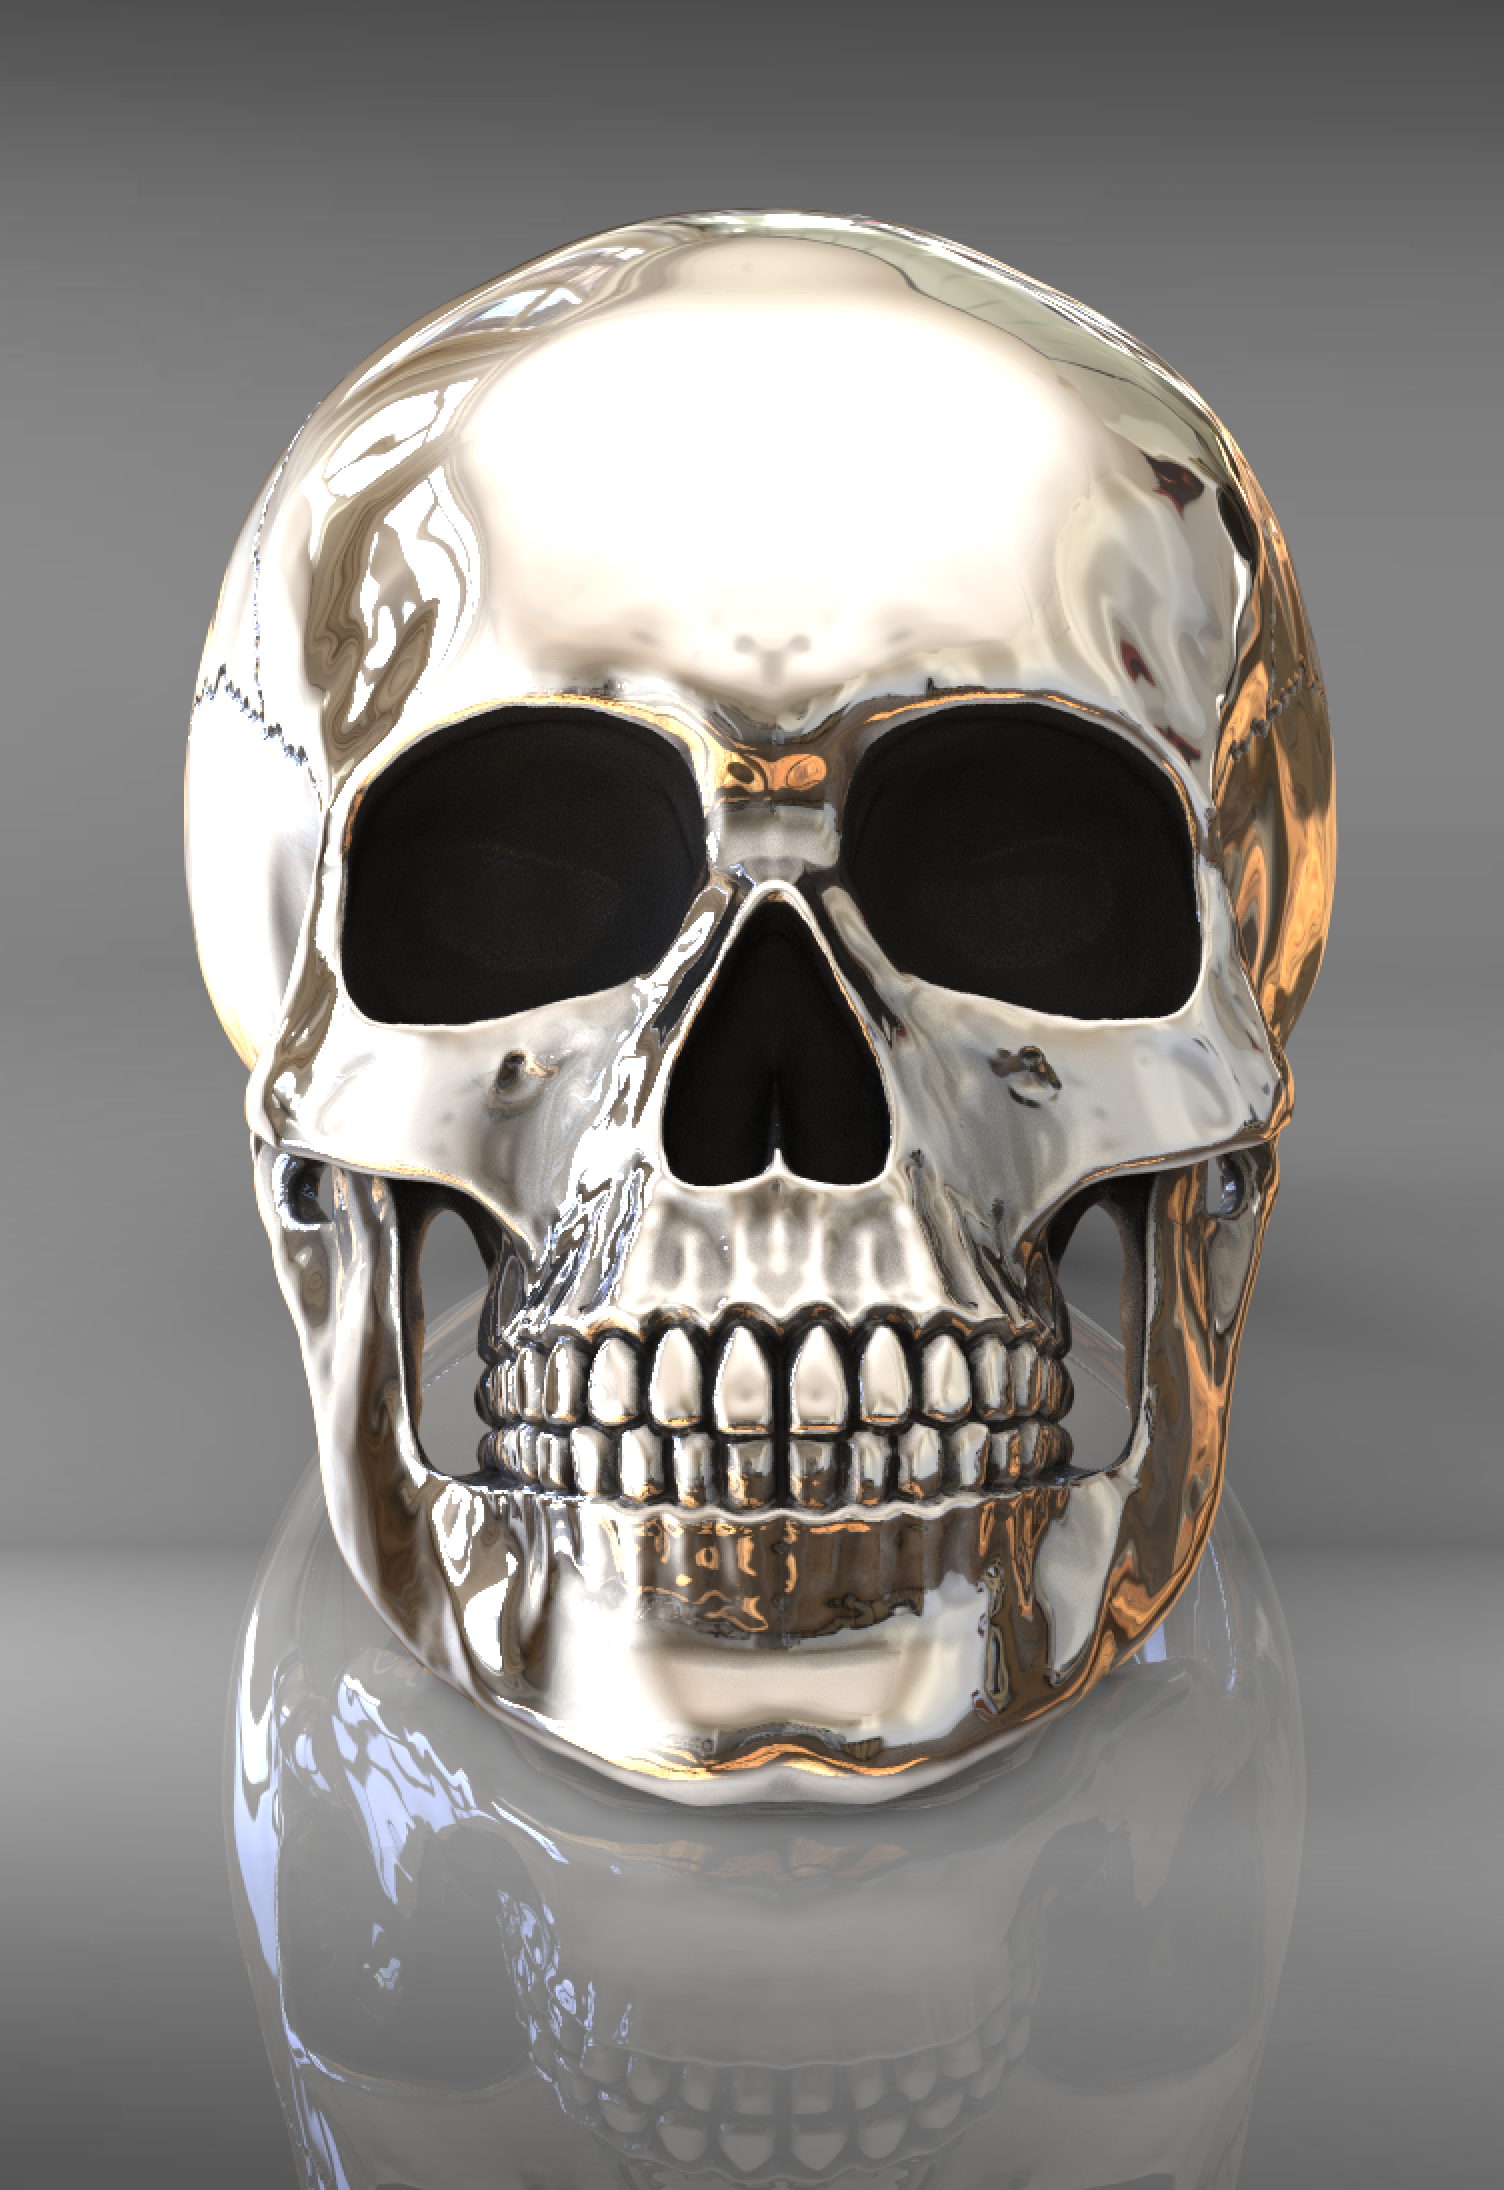 Anatomical full skull ring in 2020 Skull, Skull jewelry